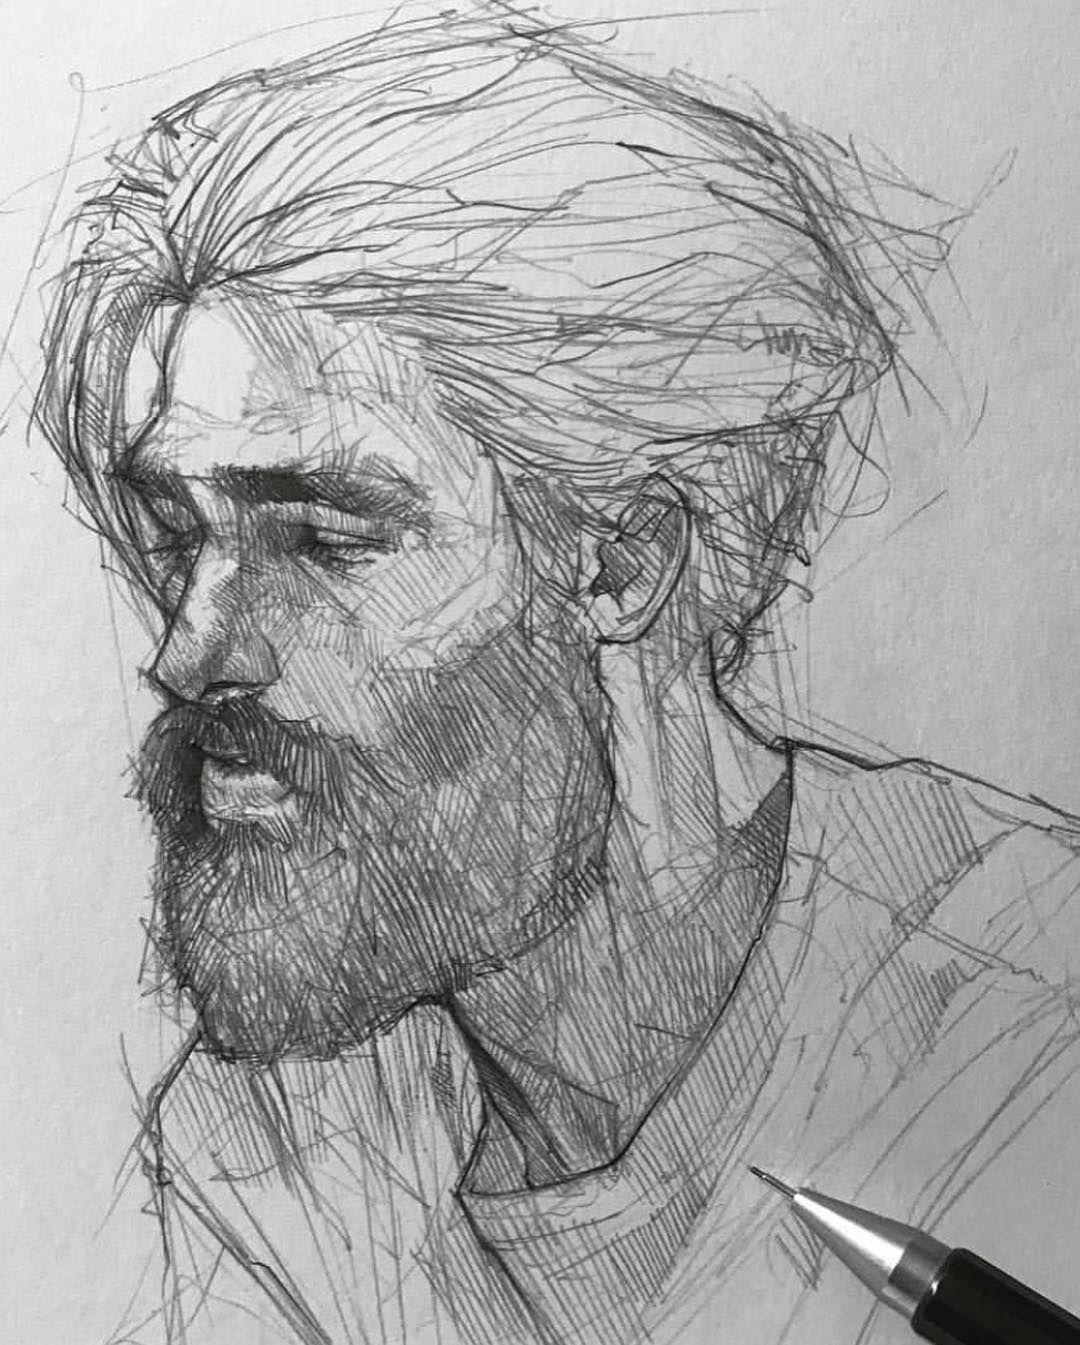 Pencil Sketch Artist Efrain Malo Drawing Artwoonz Art Sketches Art Sketches Pencil Art Drawings Beautiful